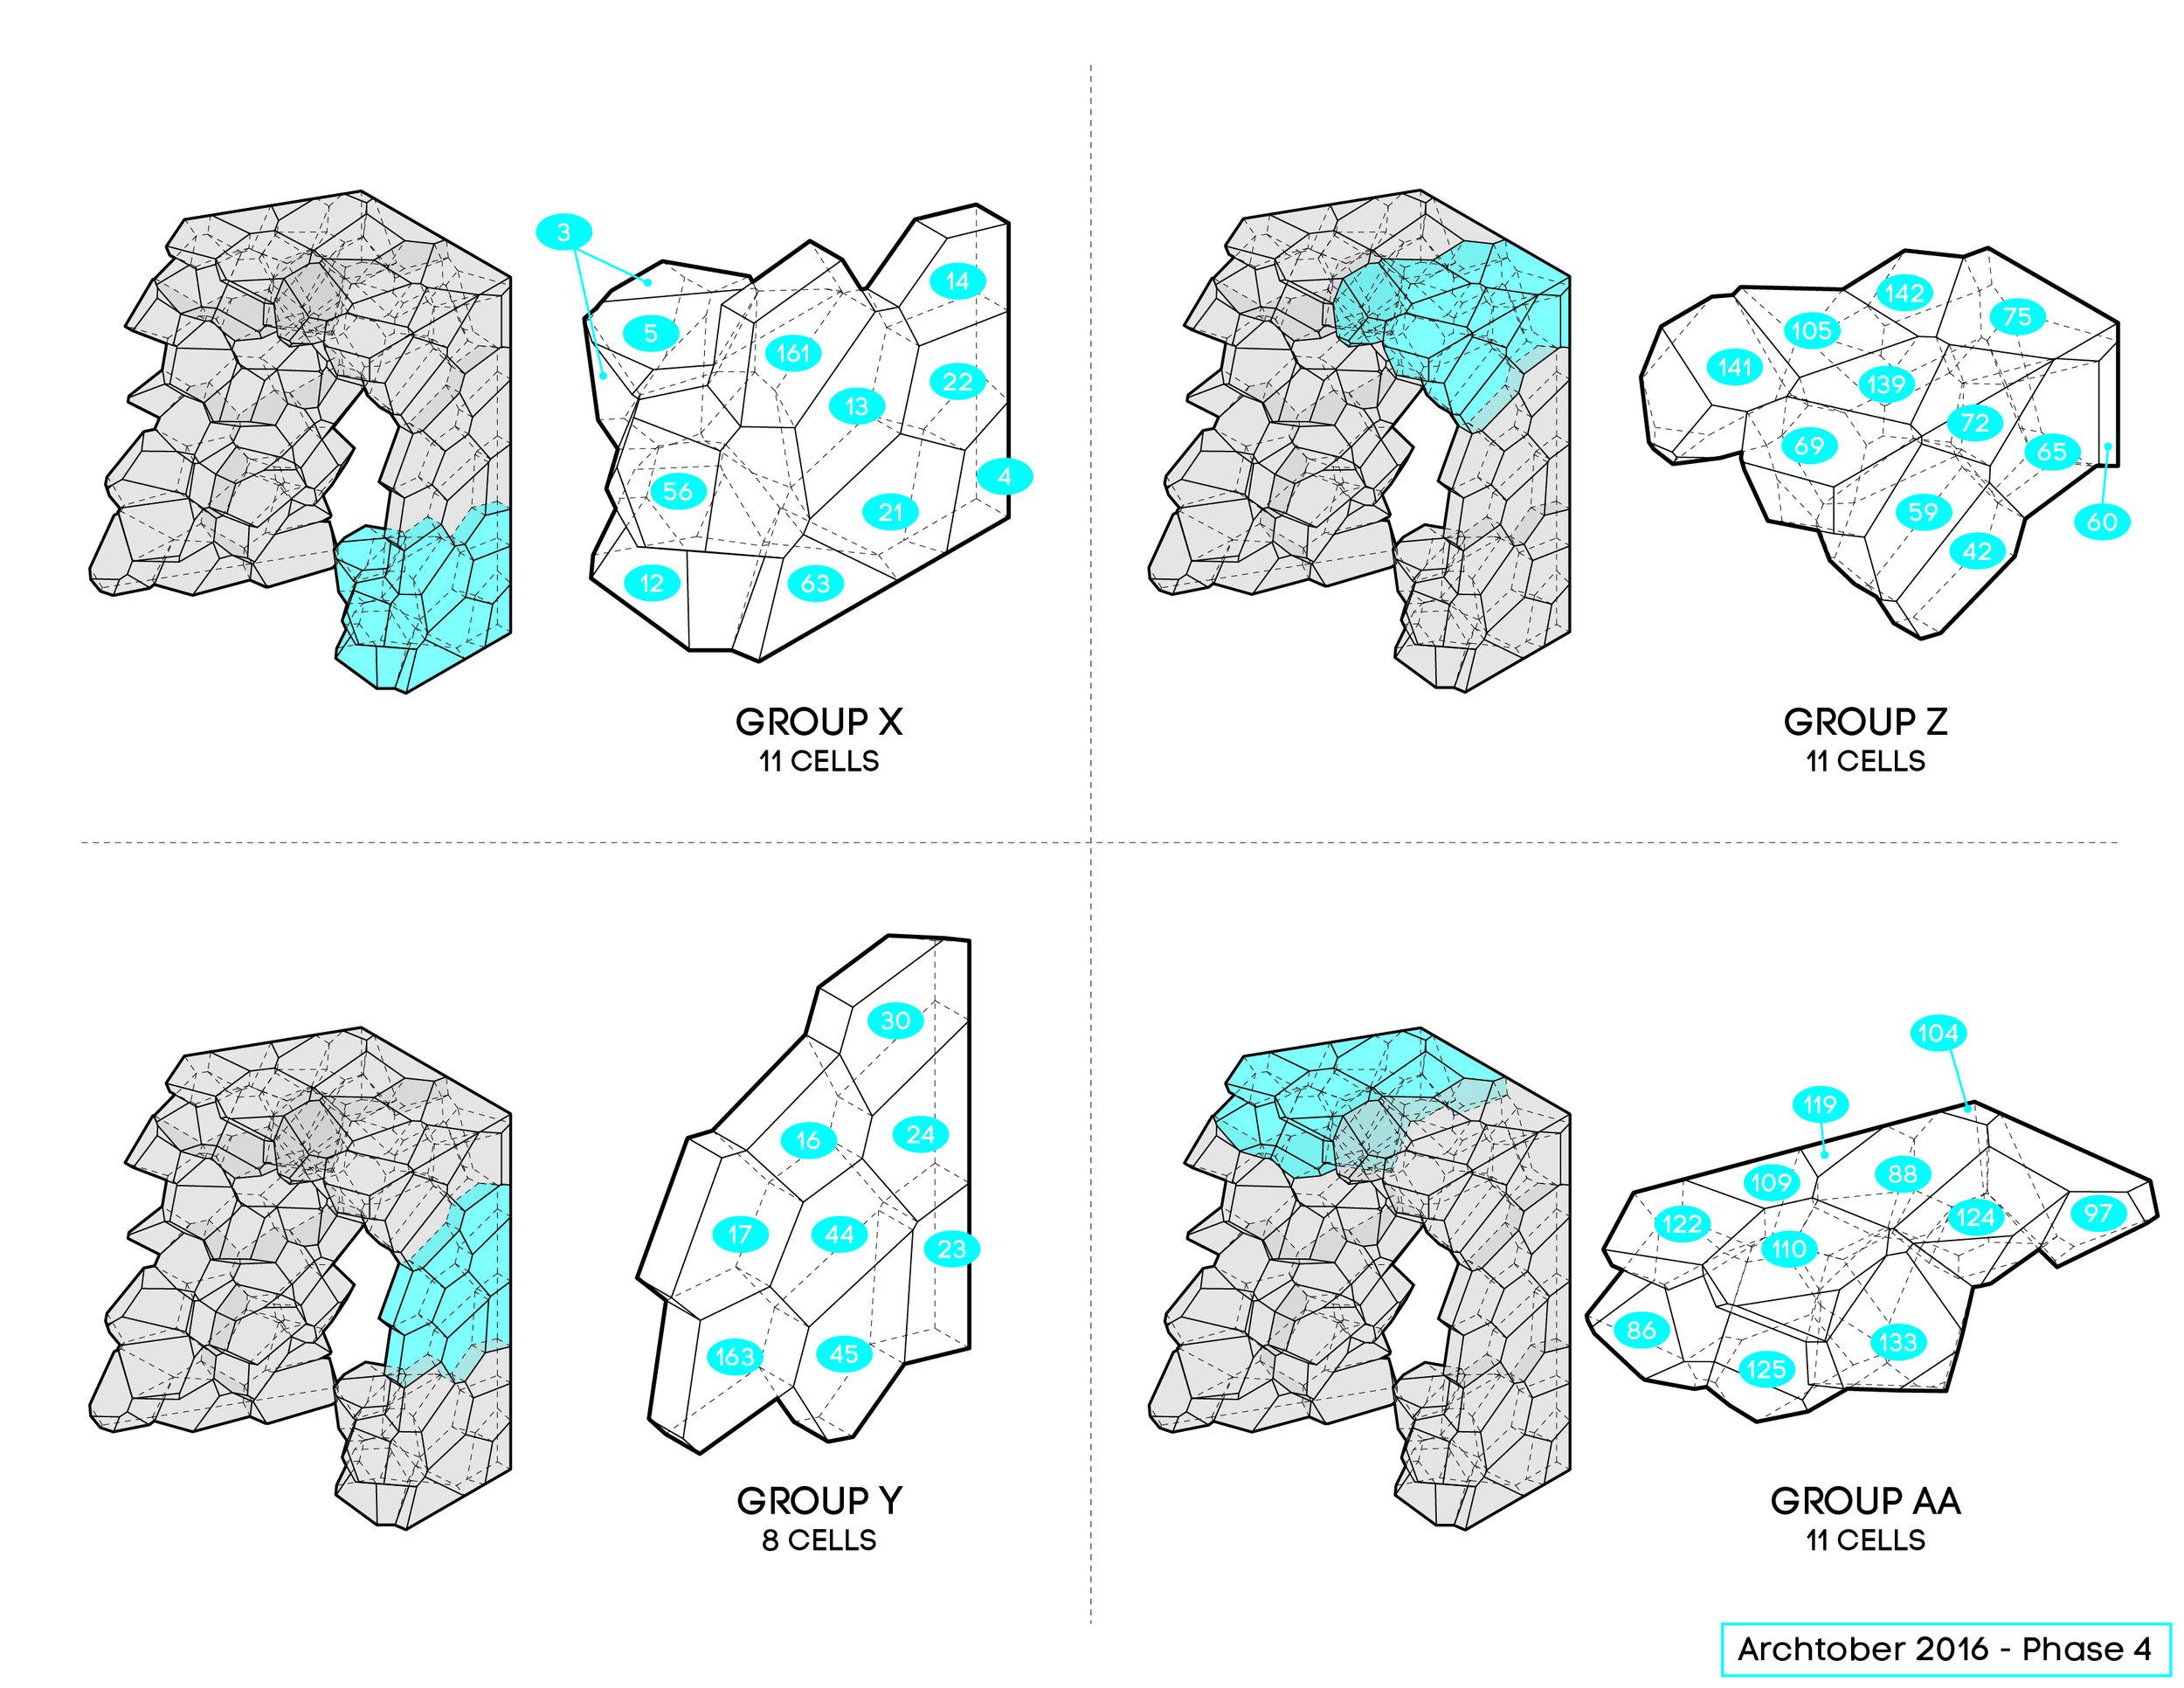 091216_assembly drawings-08.jpg